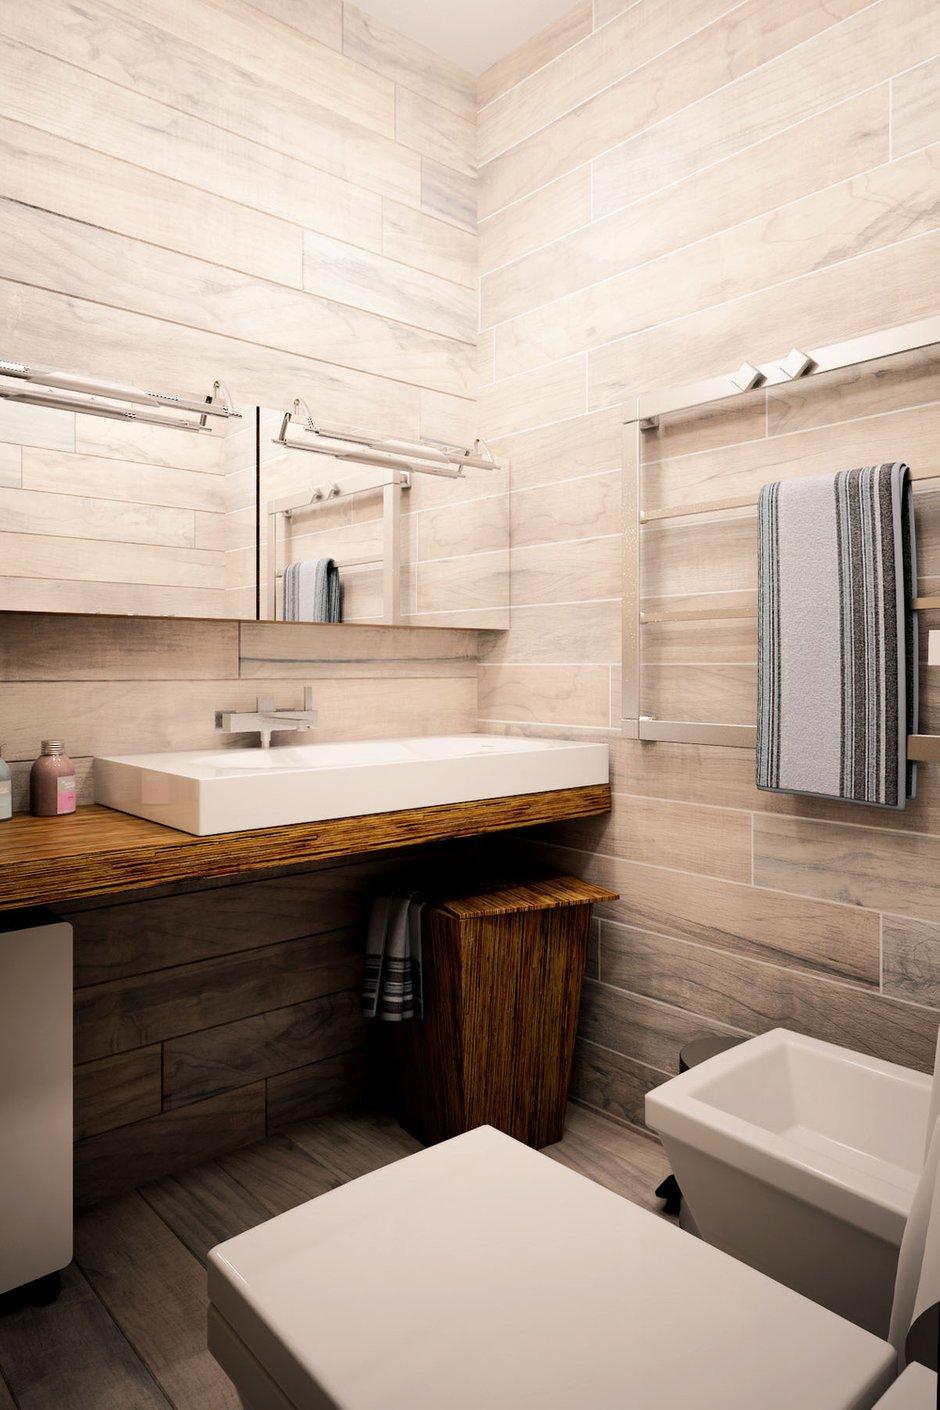 Фотография: Ванная в стиле Лофт, Квартира, Дом, Дома и квартиры, Проект недели – фото на InMyRoom.ru